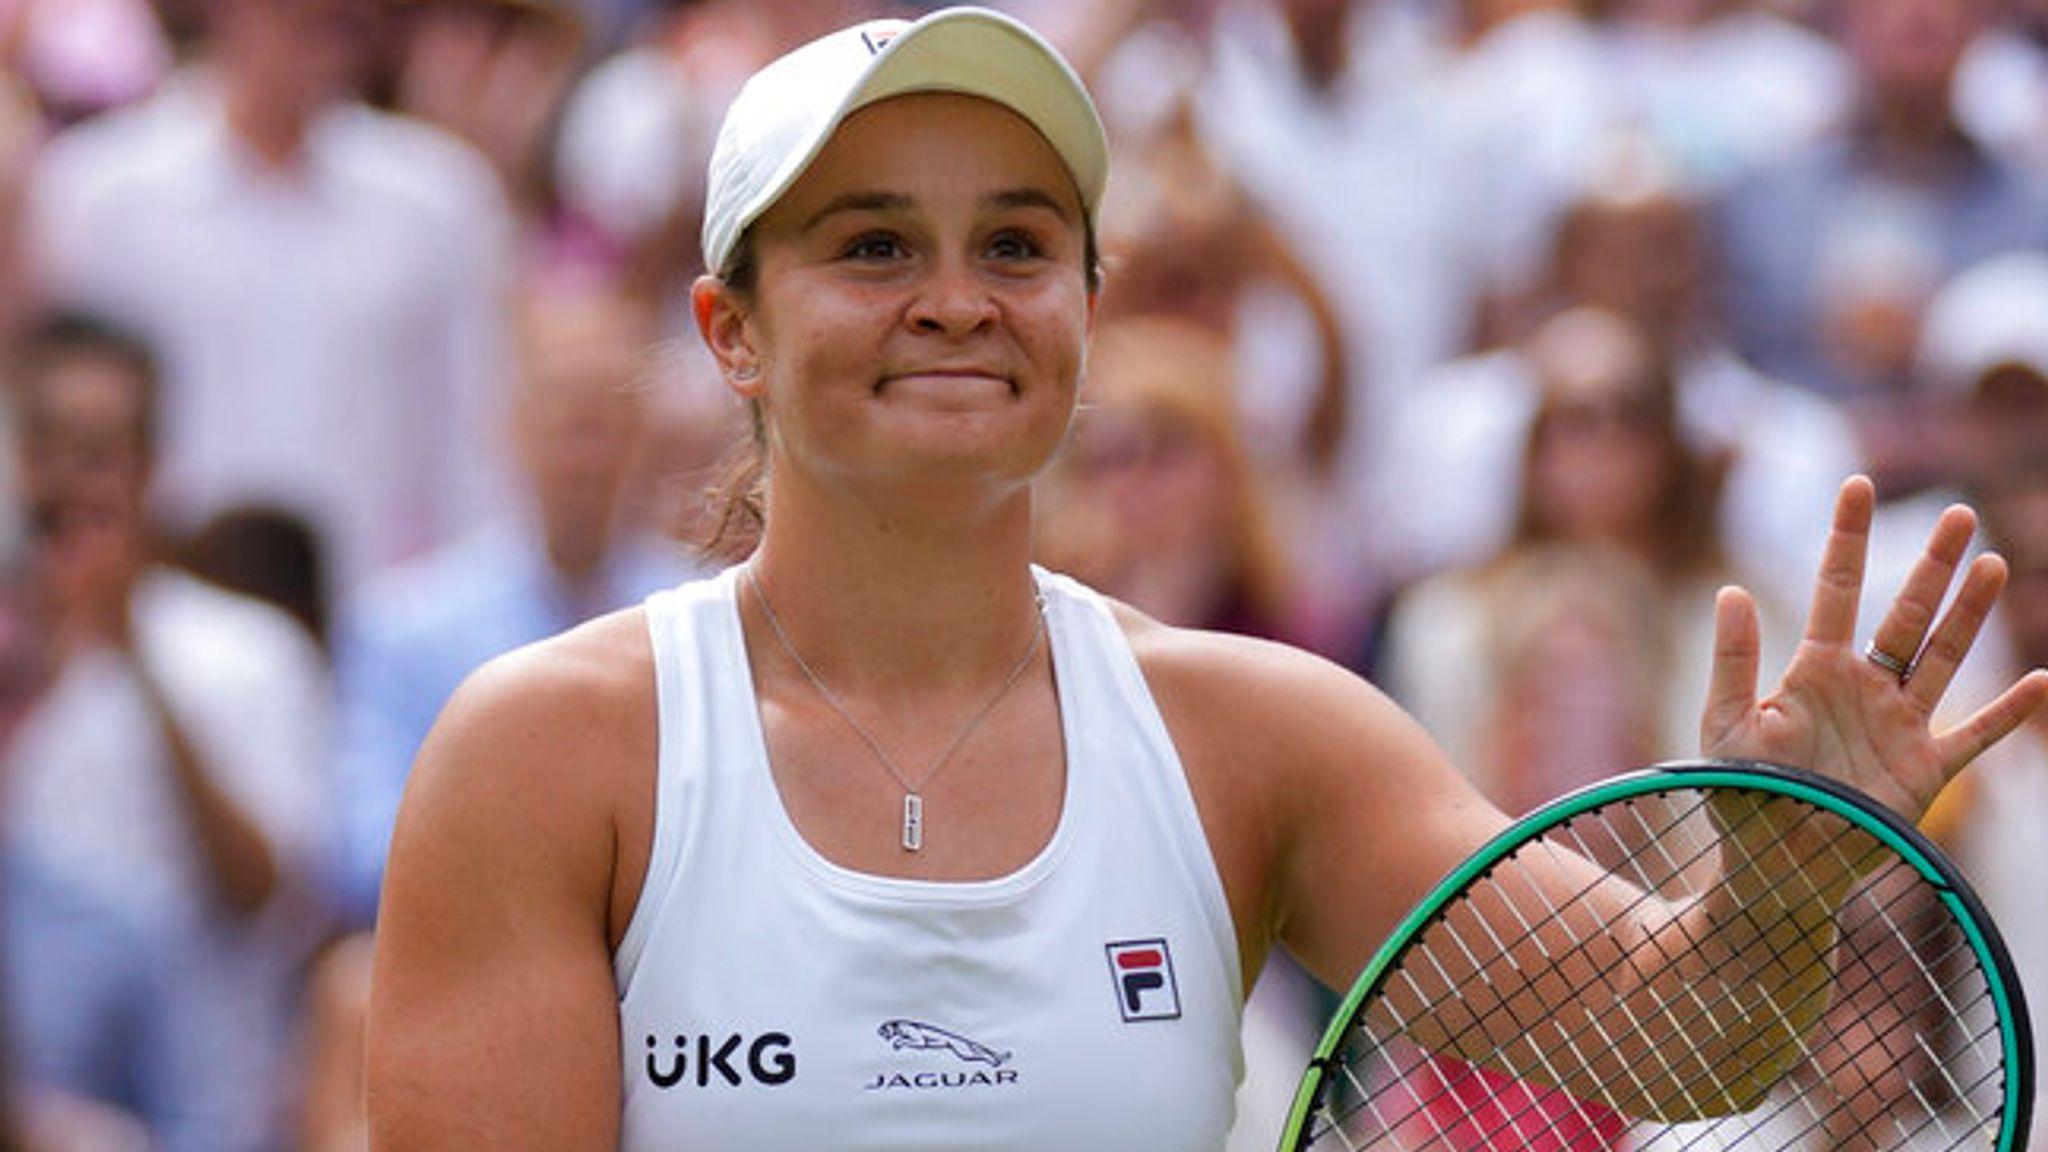 Wimbledon Championships 2021: Ashleigh Barty vs. Karolina Pliskova Tennis Pick and Prediction